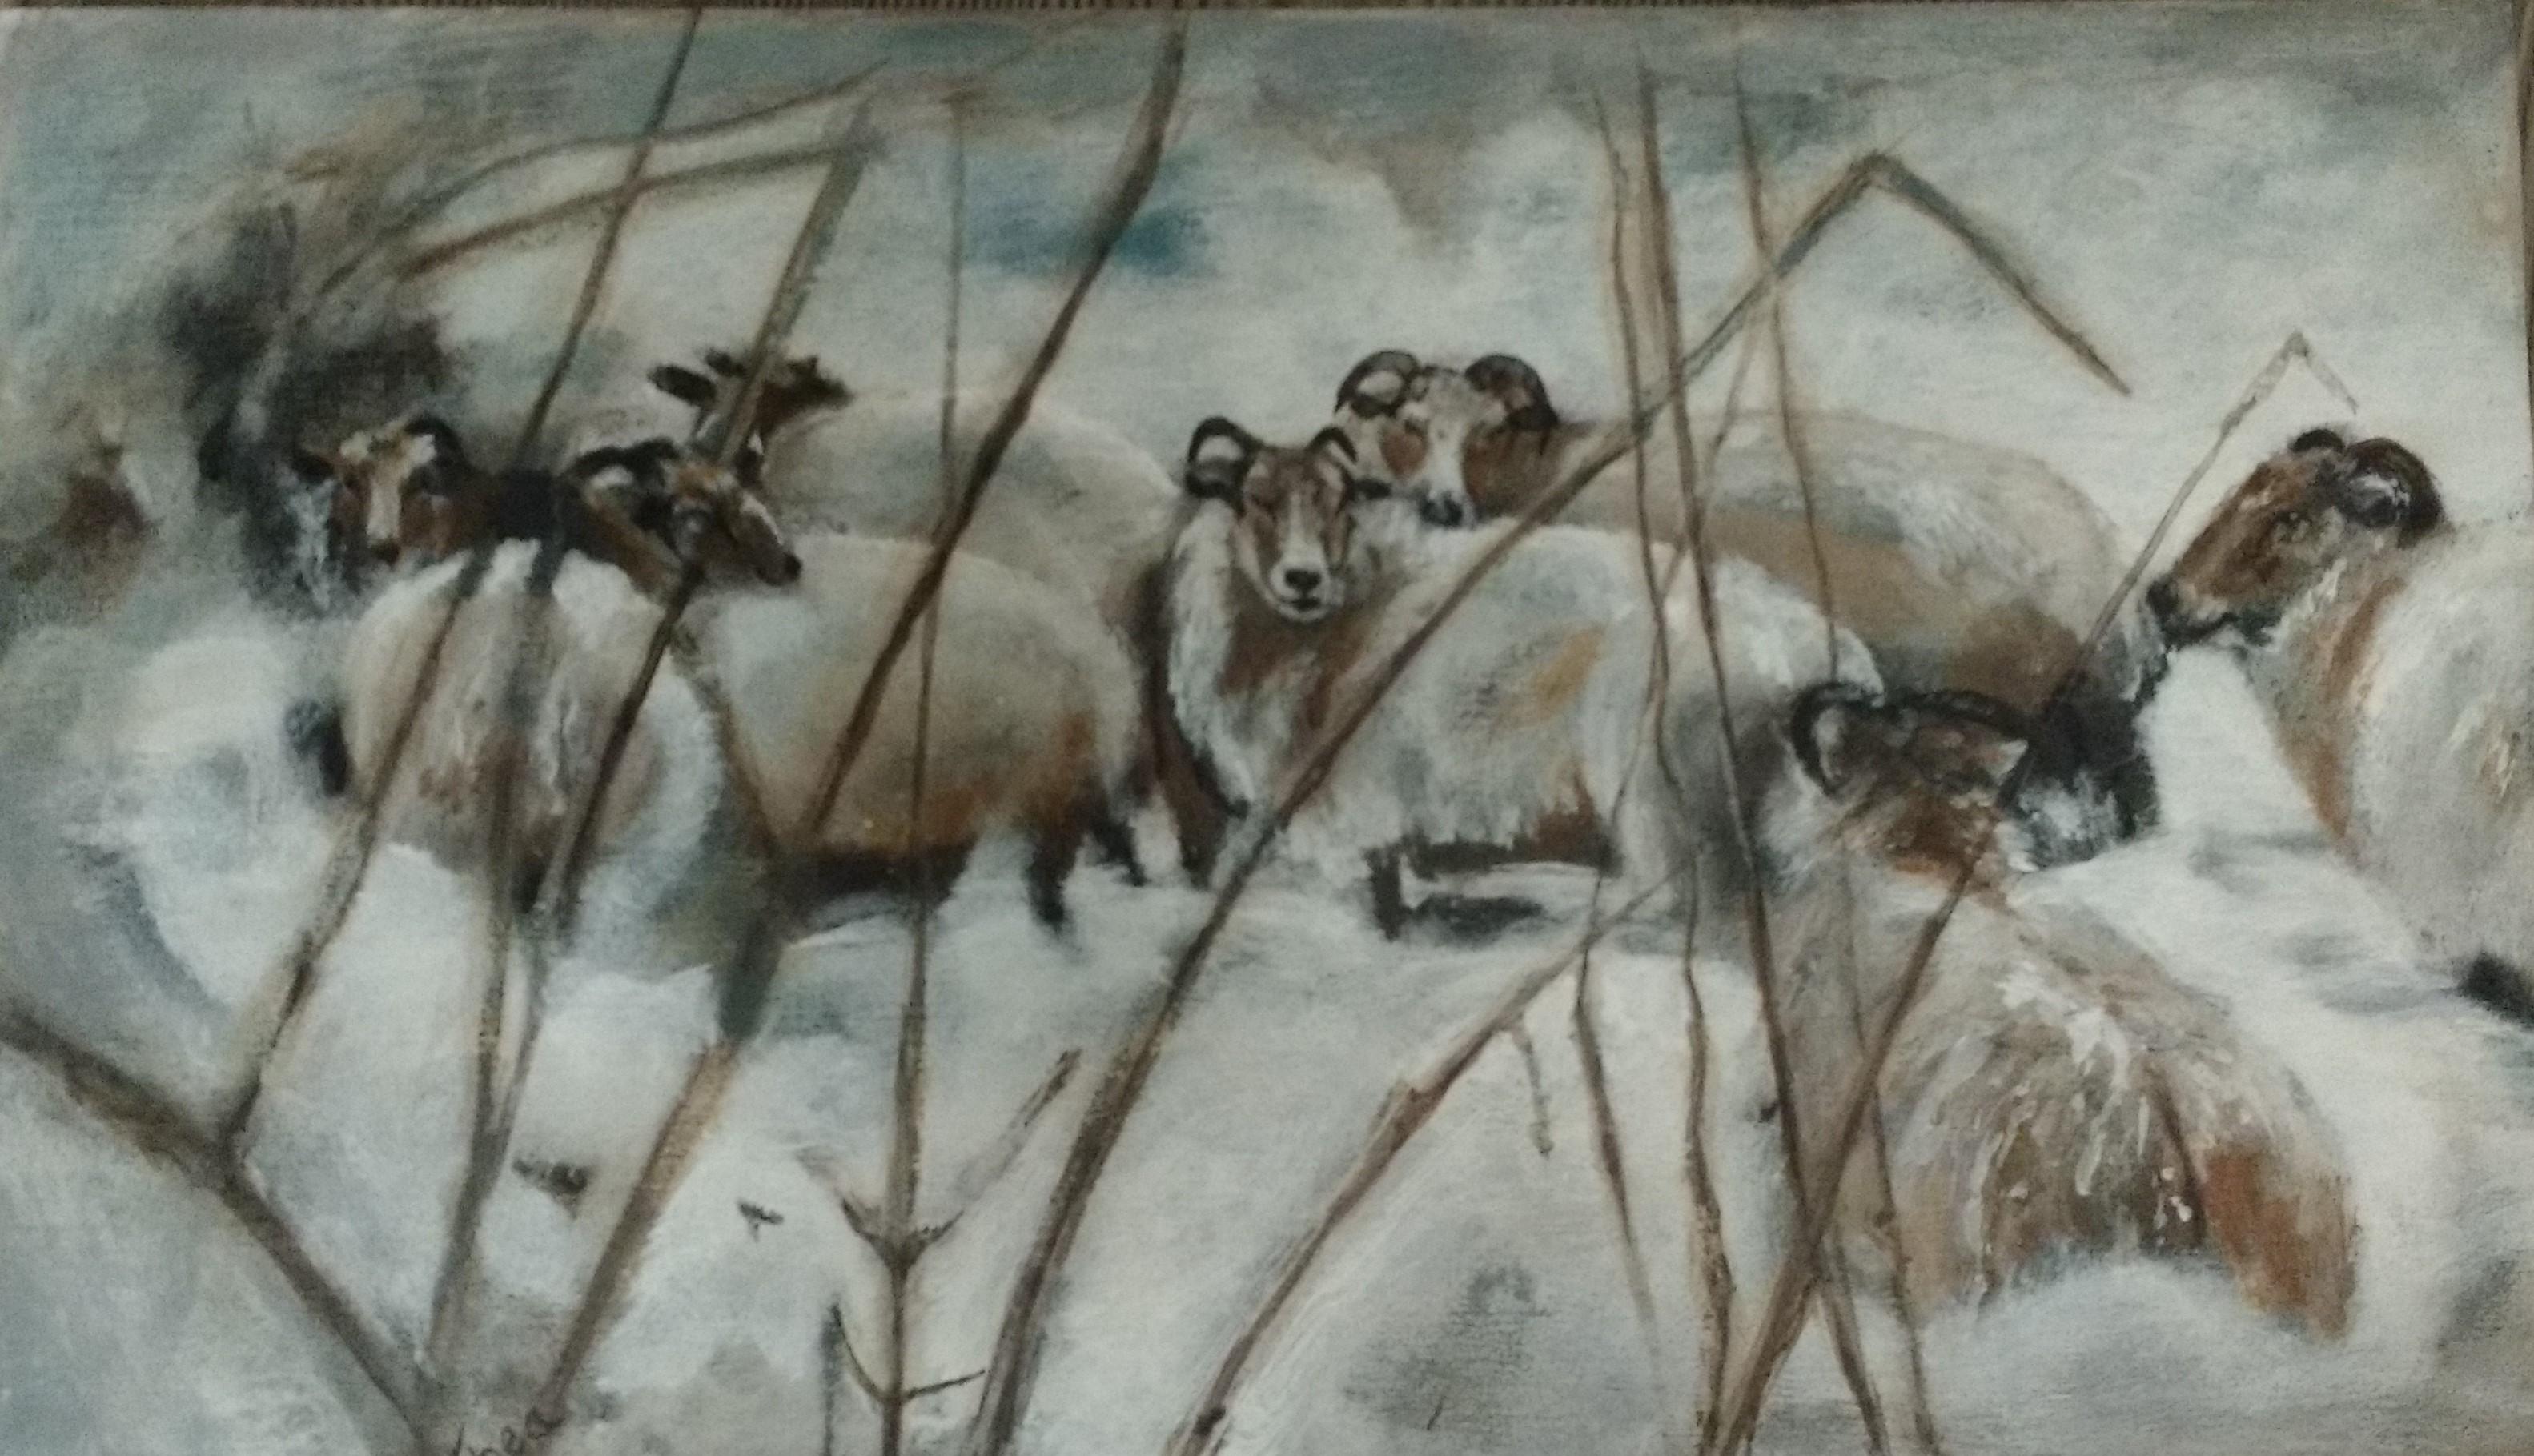 Schaapjes trotseren de winter